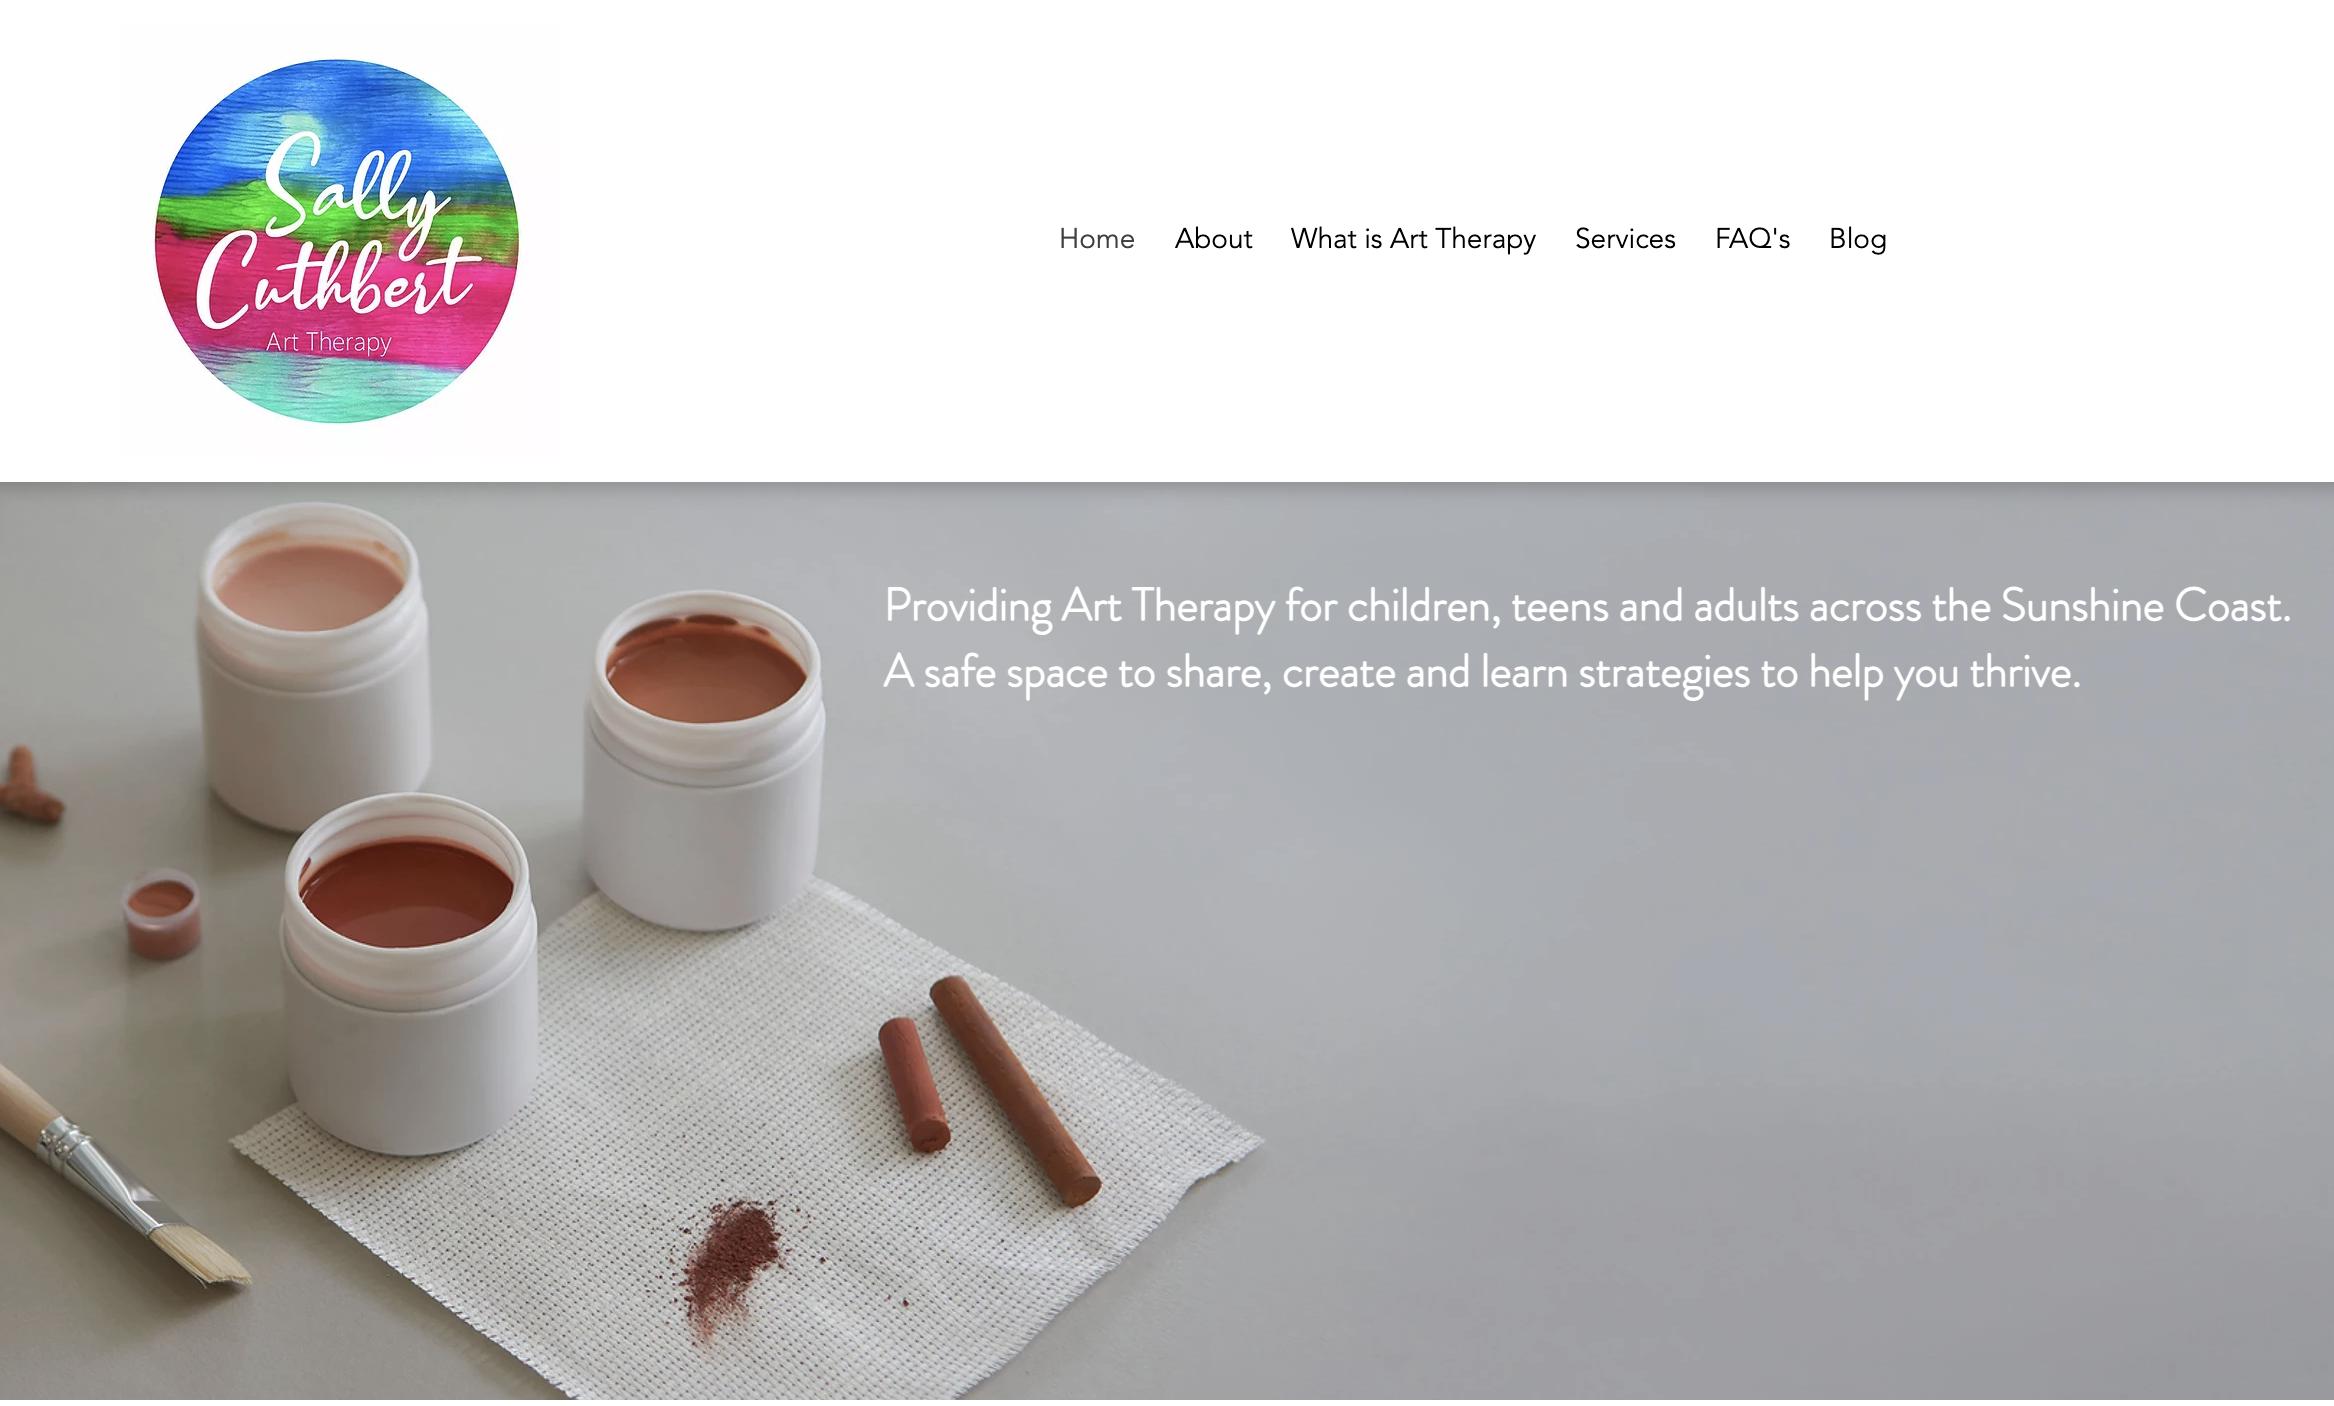 Sally Website